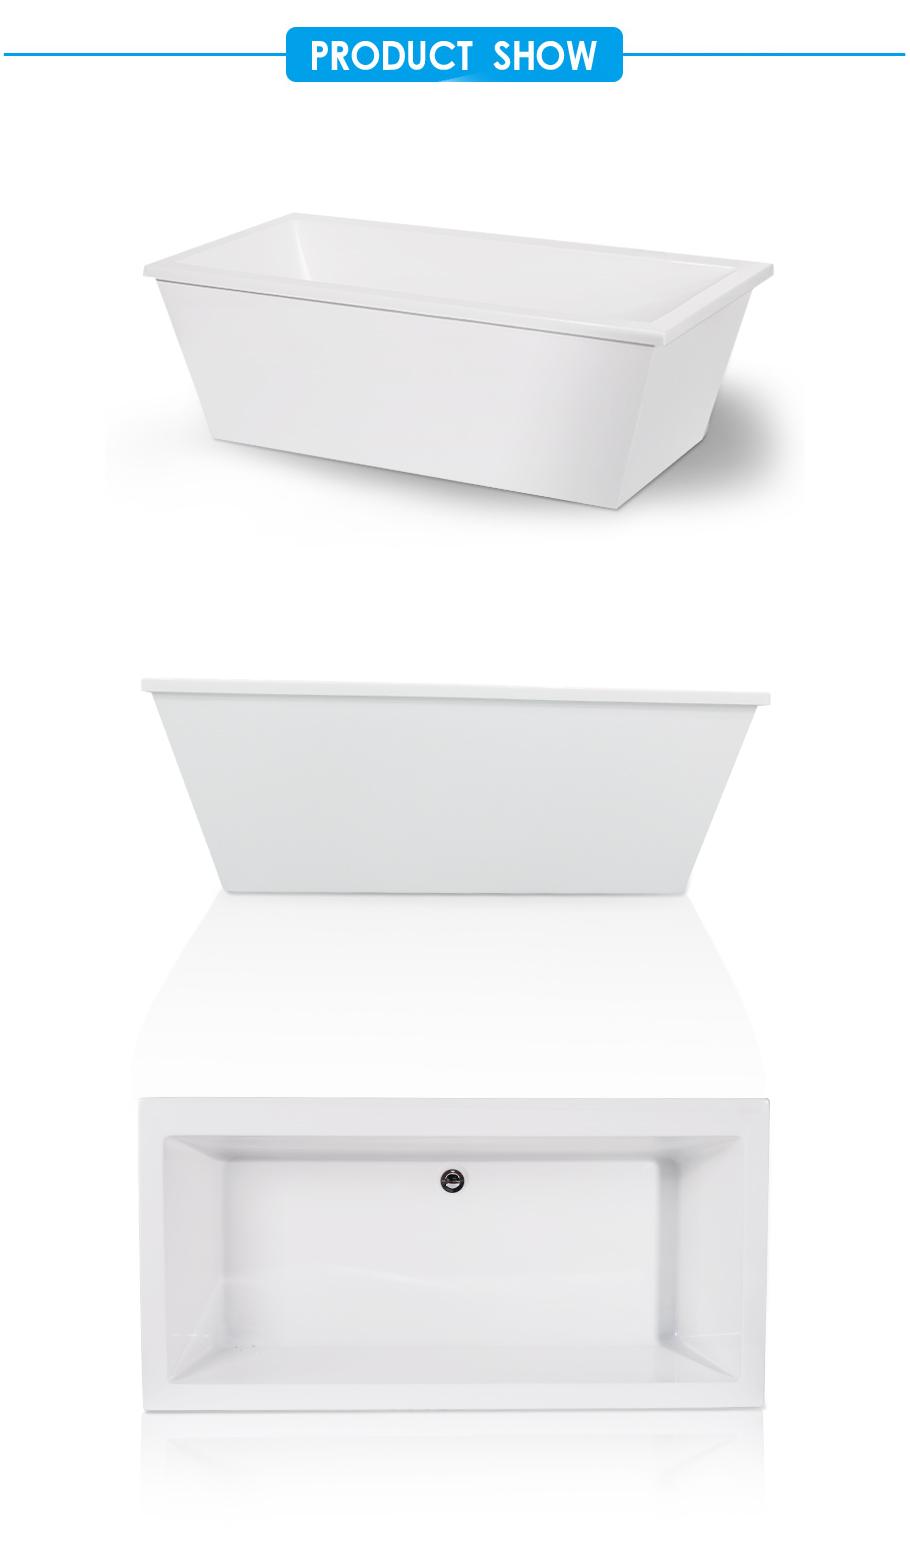 Laxson Canada Style Acrylic Freestanding Bathtub